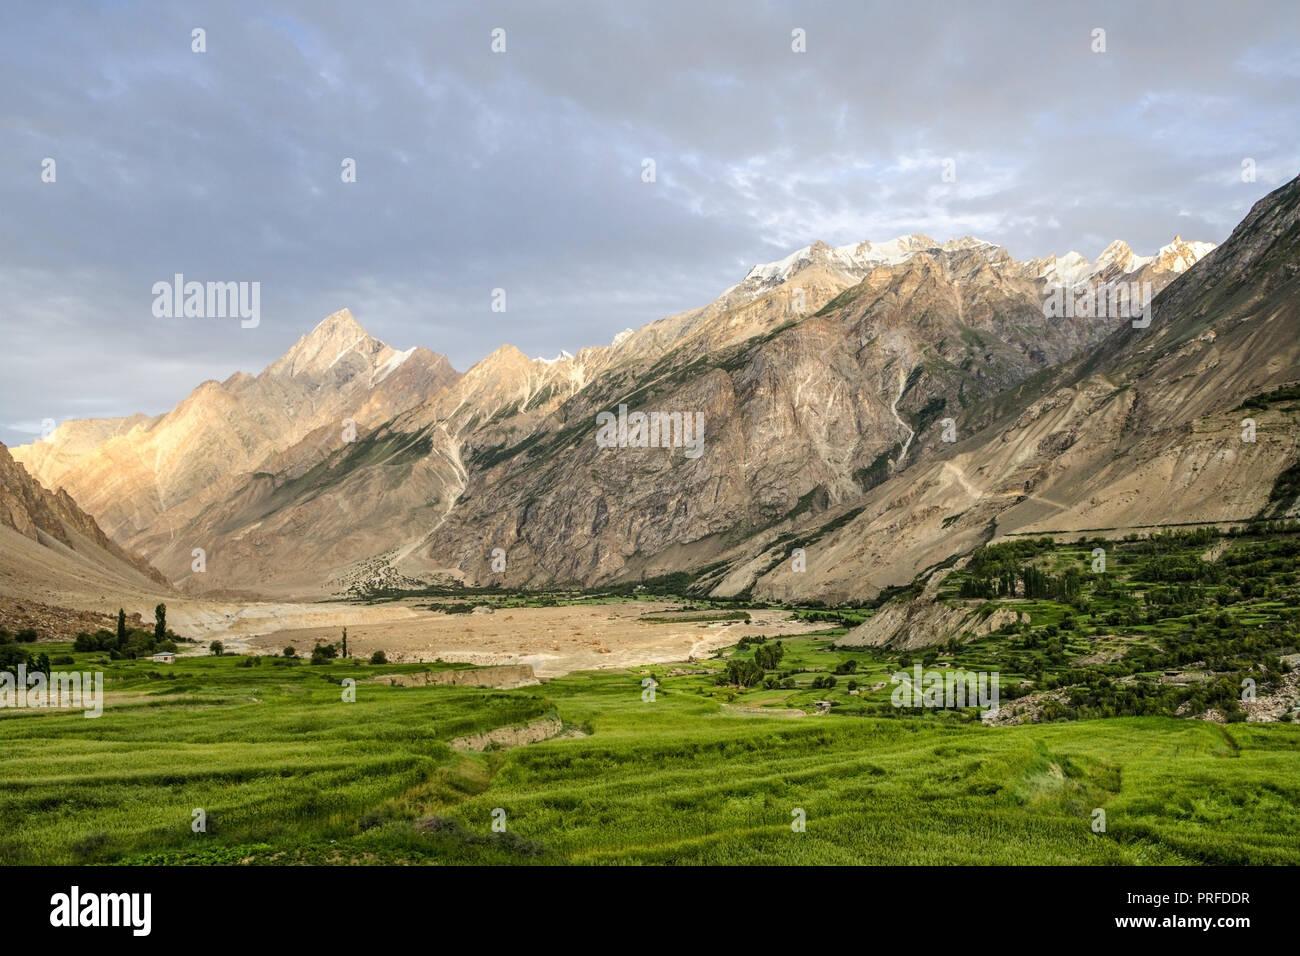 View from the fields of Askole village, Gilgit-Baltistan, Pakistan - Stock Image